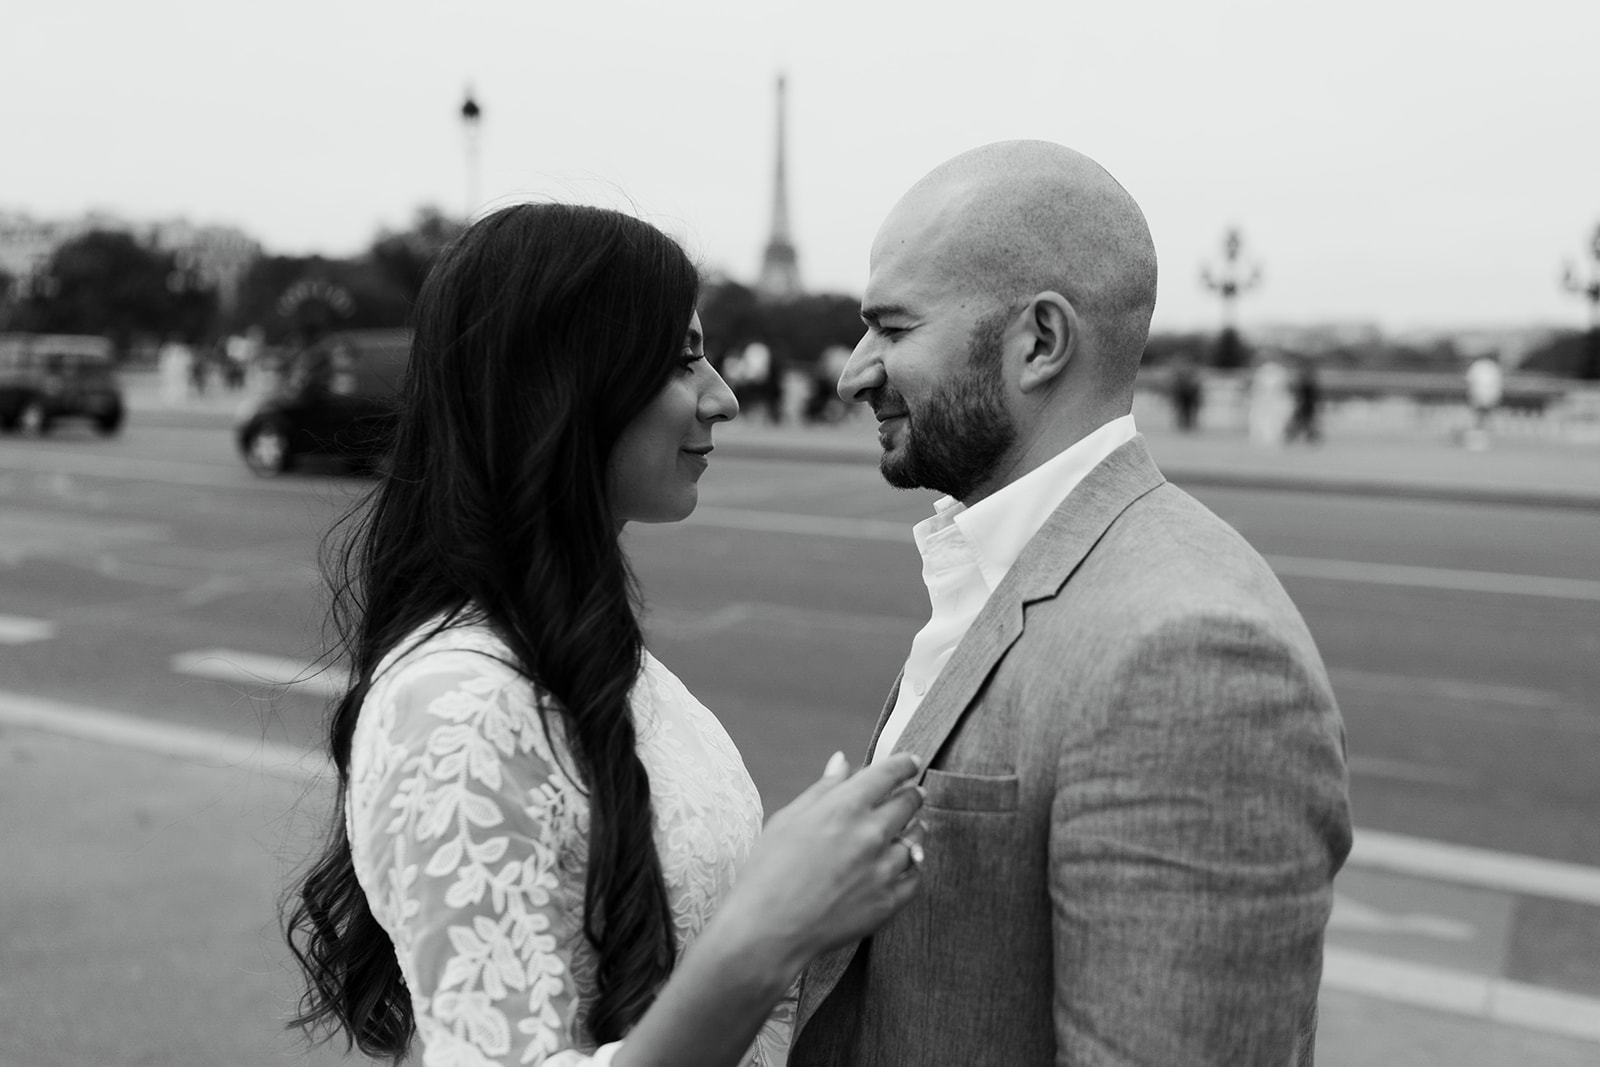 Sabri-photographe-sayde-_-george-wedding-174.jpg